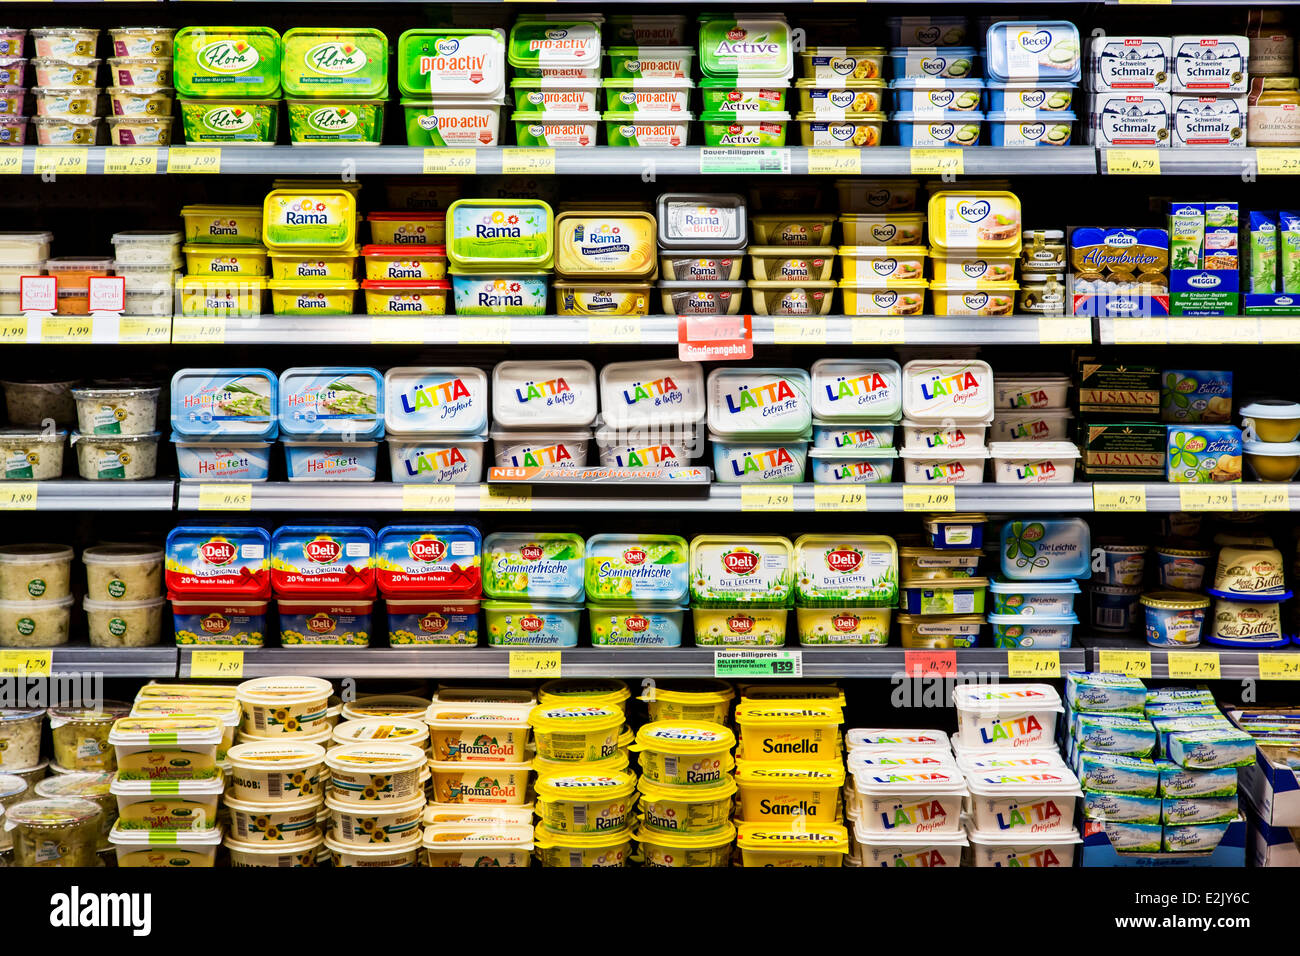 Food Store Chain Japan